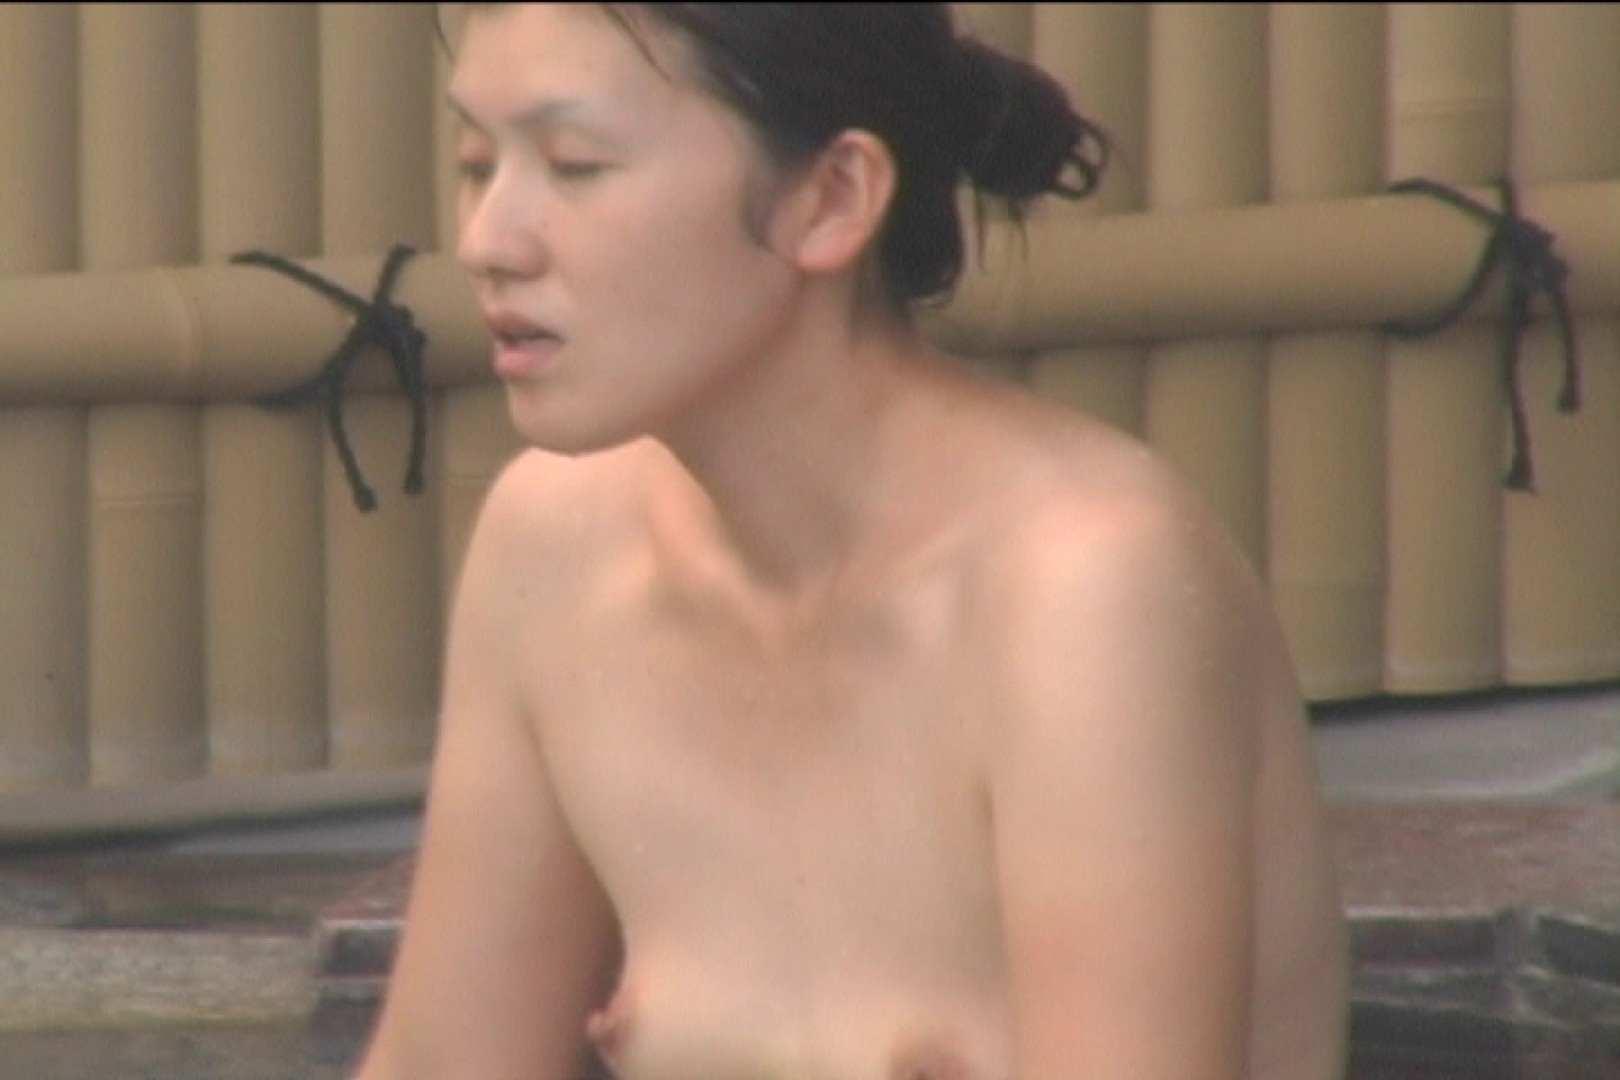 Aquaな露天風呂Vol.532 OLセックス 盗撮ワレメ無修正動画無料 105画像 32